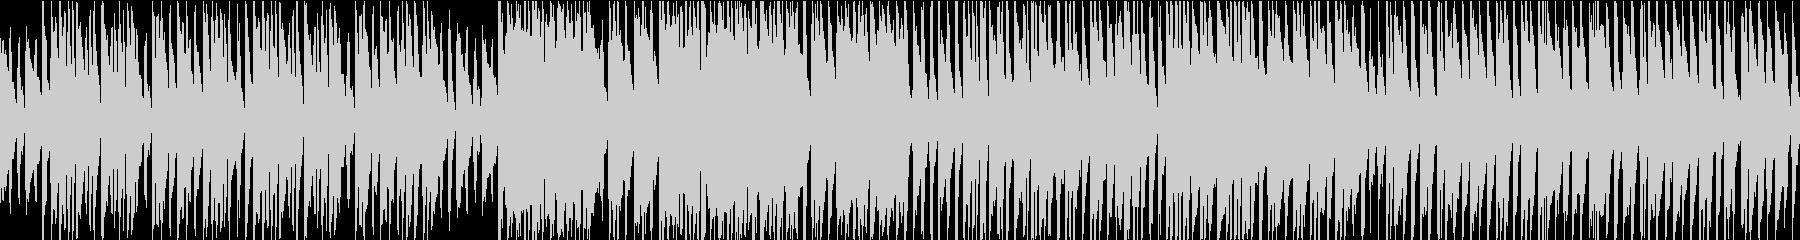 [Loop] Cityscape BGM / Loose / Daily's unreproduced waveform